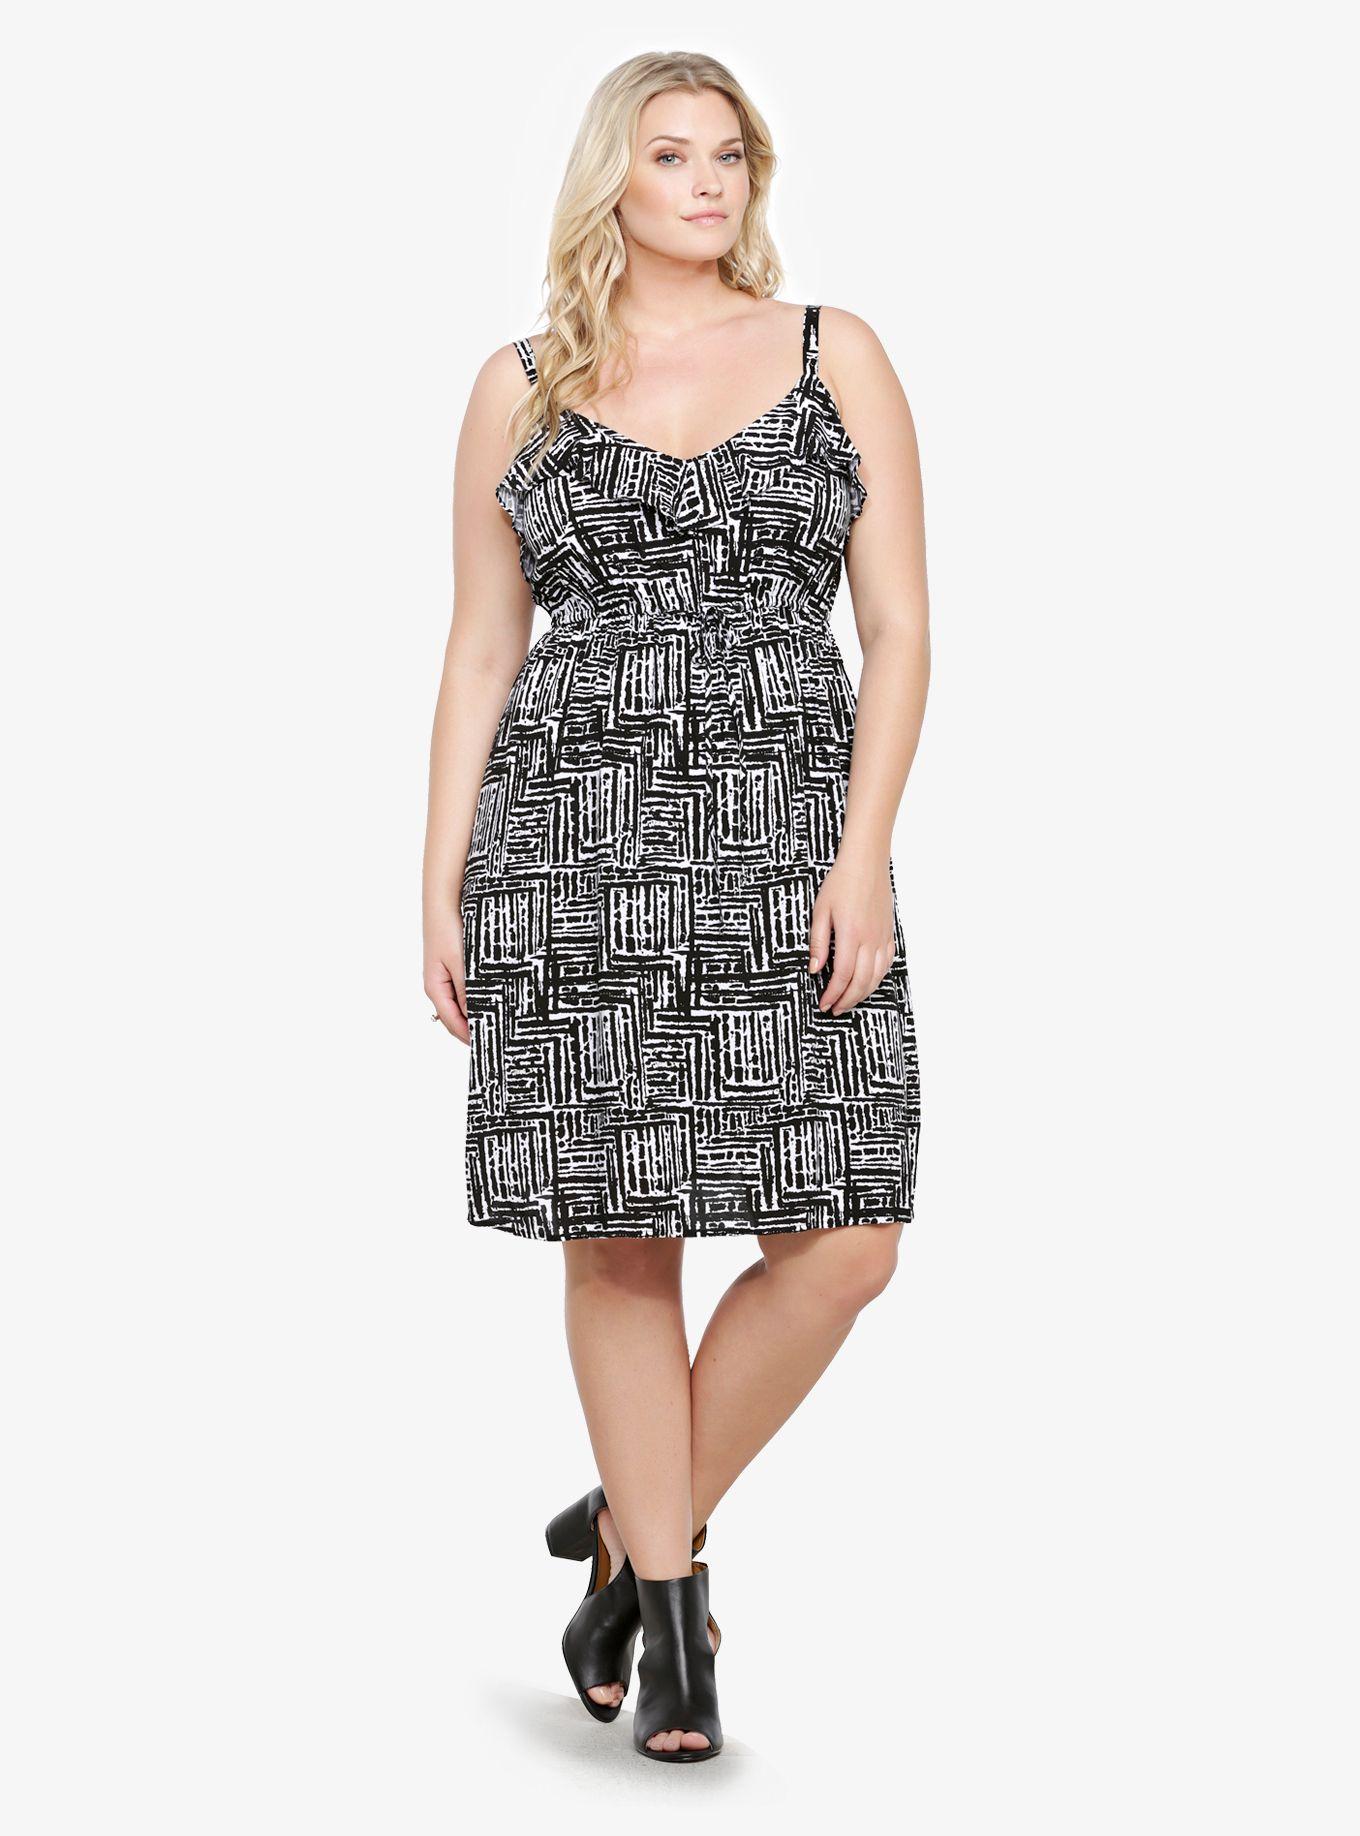 Challis ruffled dress clothes trendy plus size